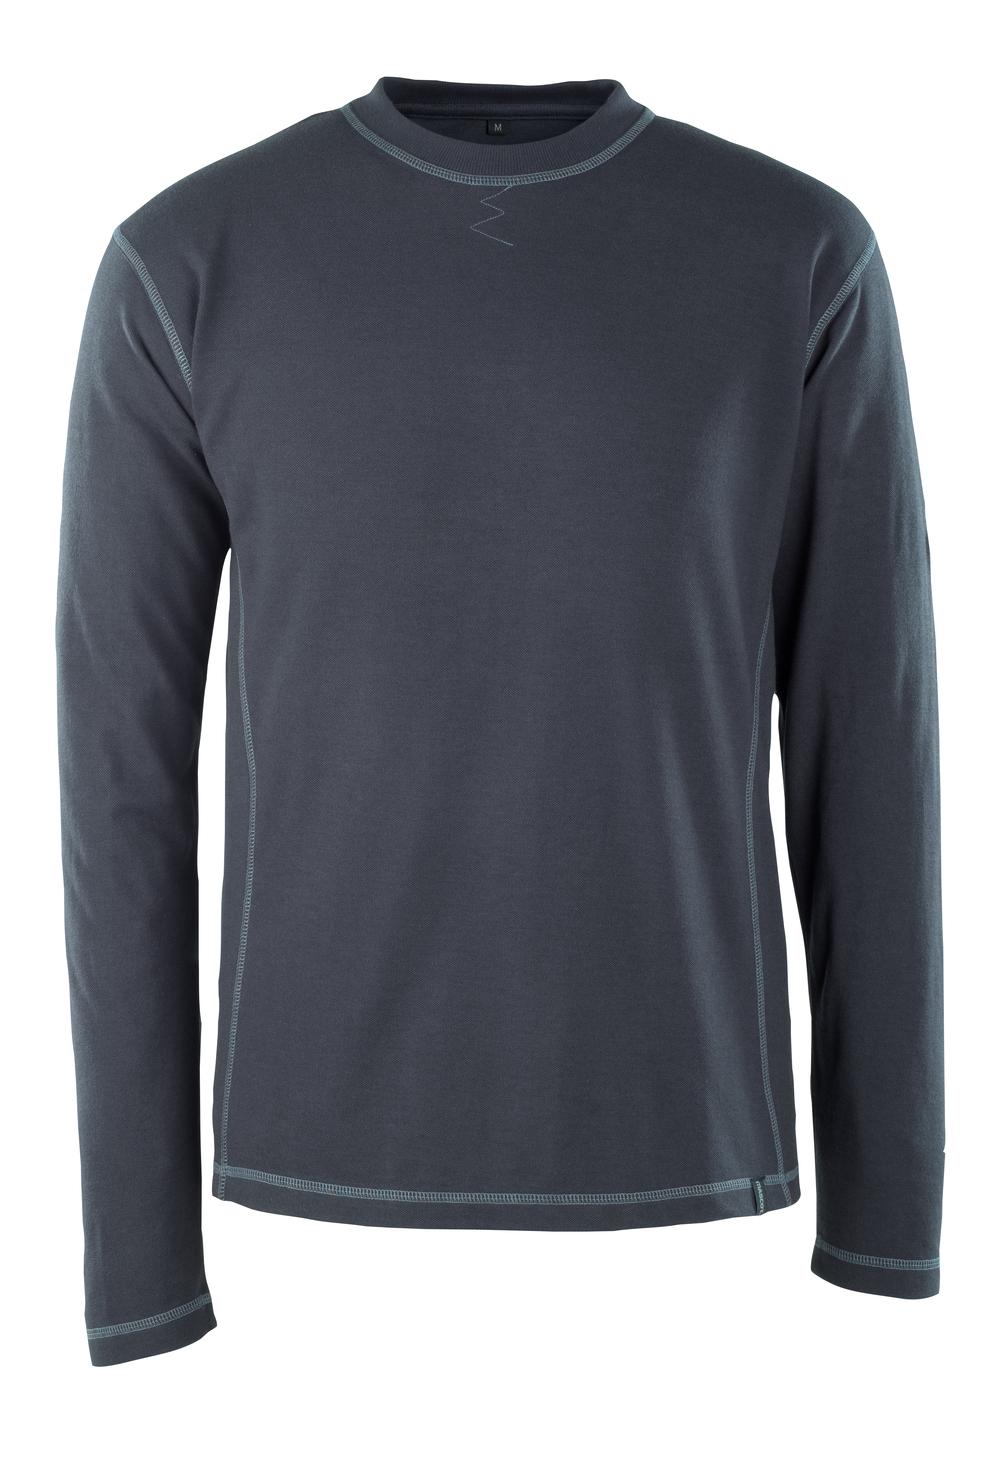 50119-927-010 T-shirt, långärmad - mörk marin